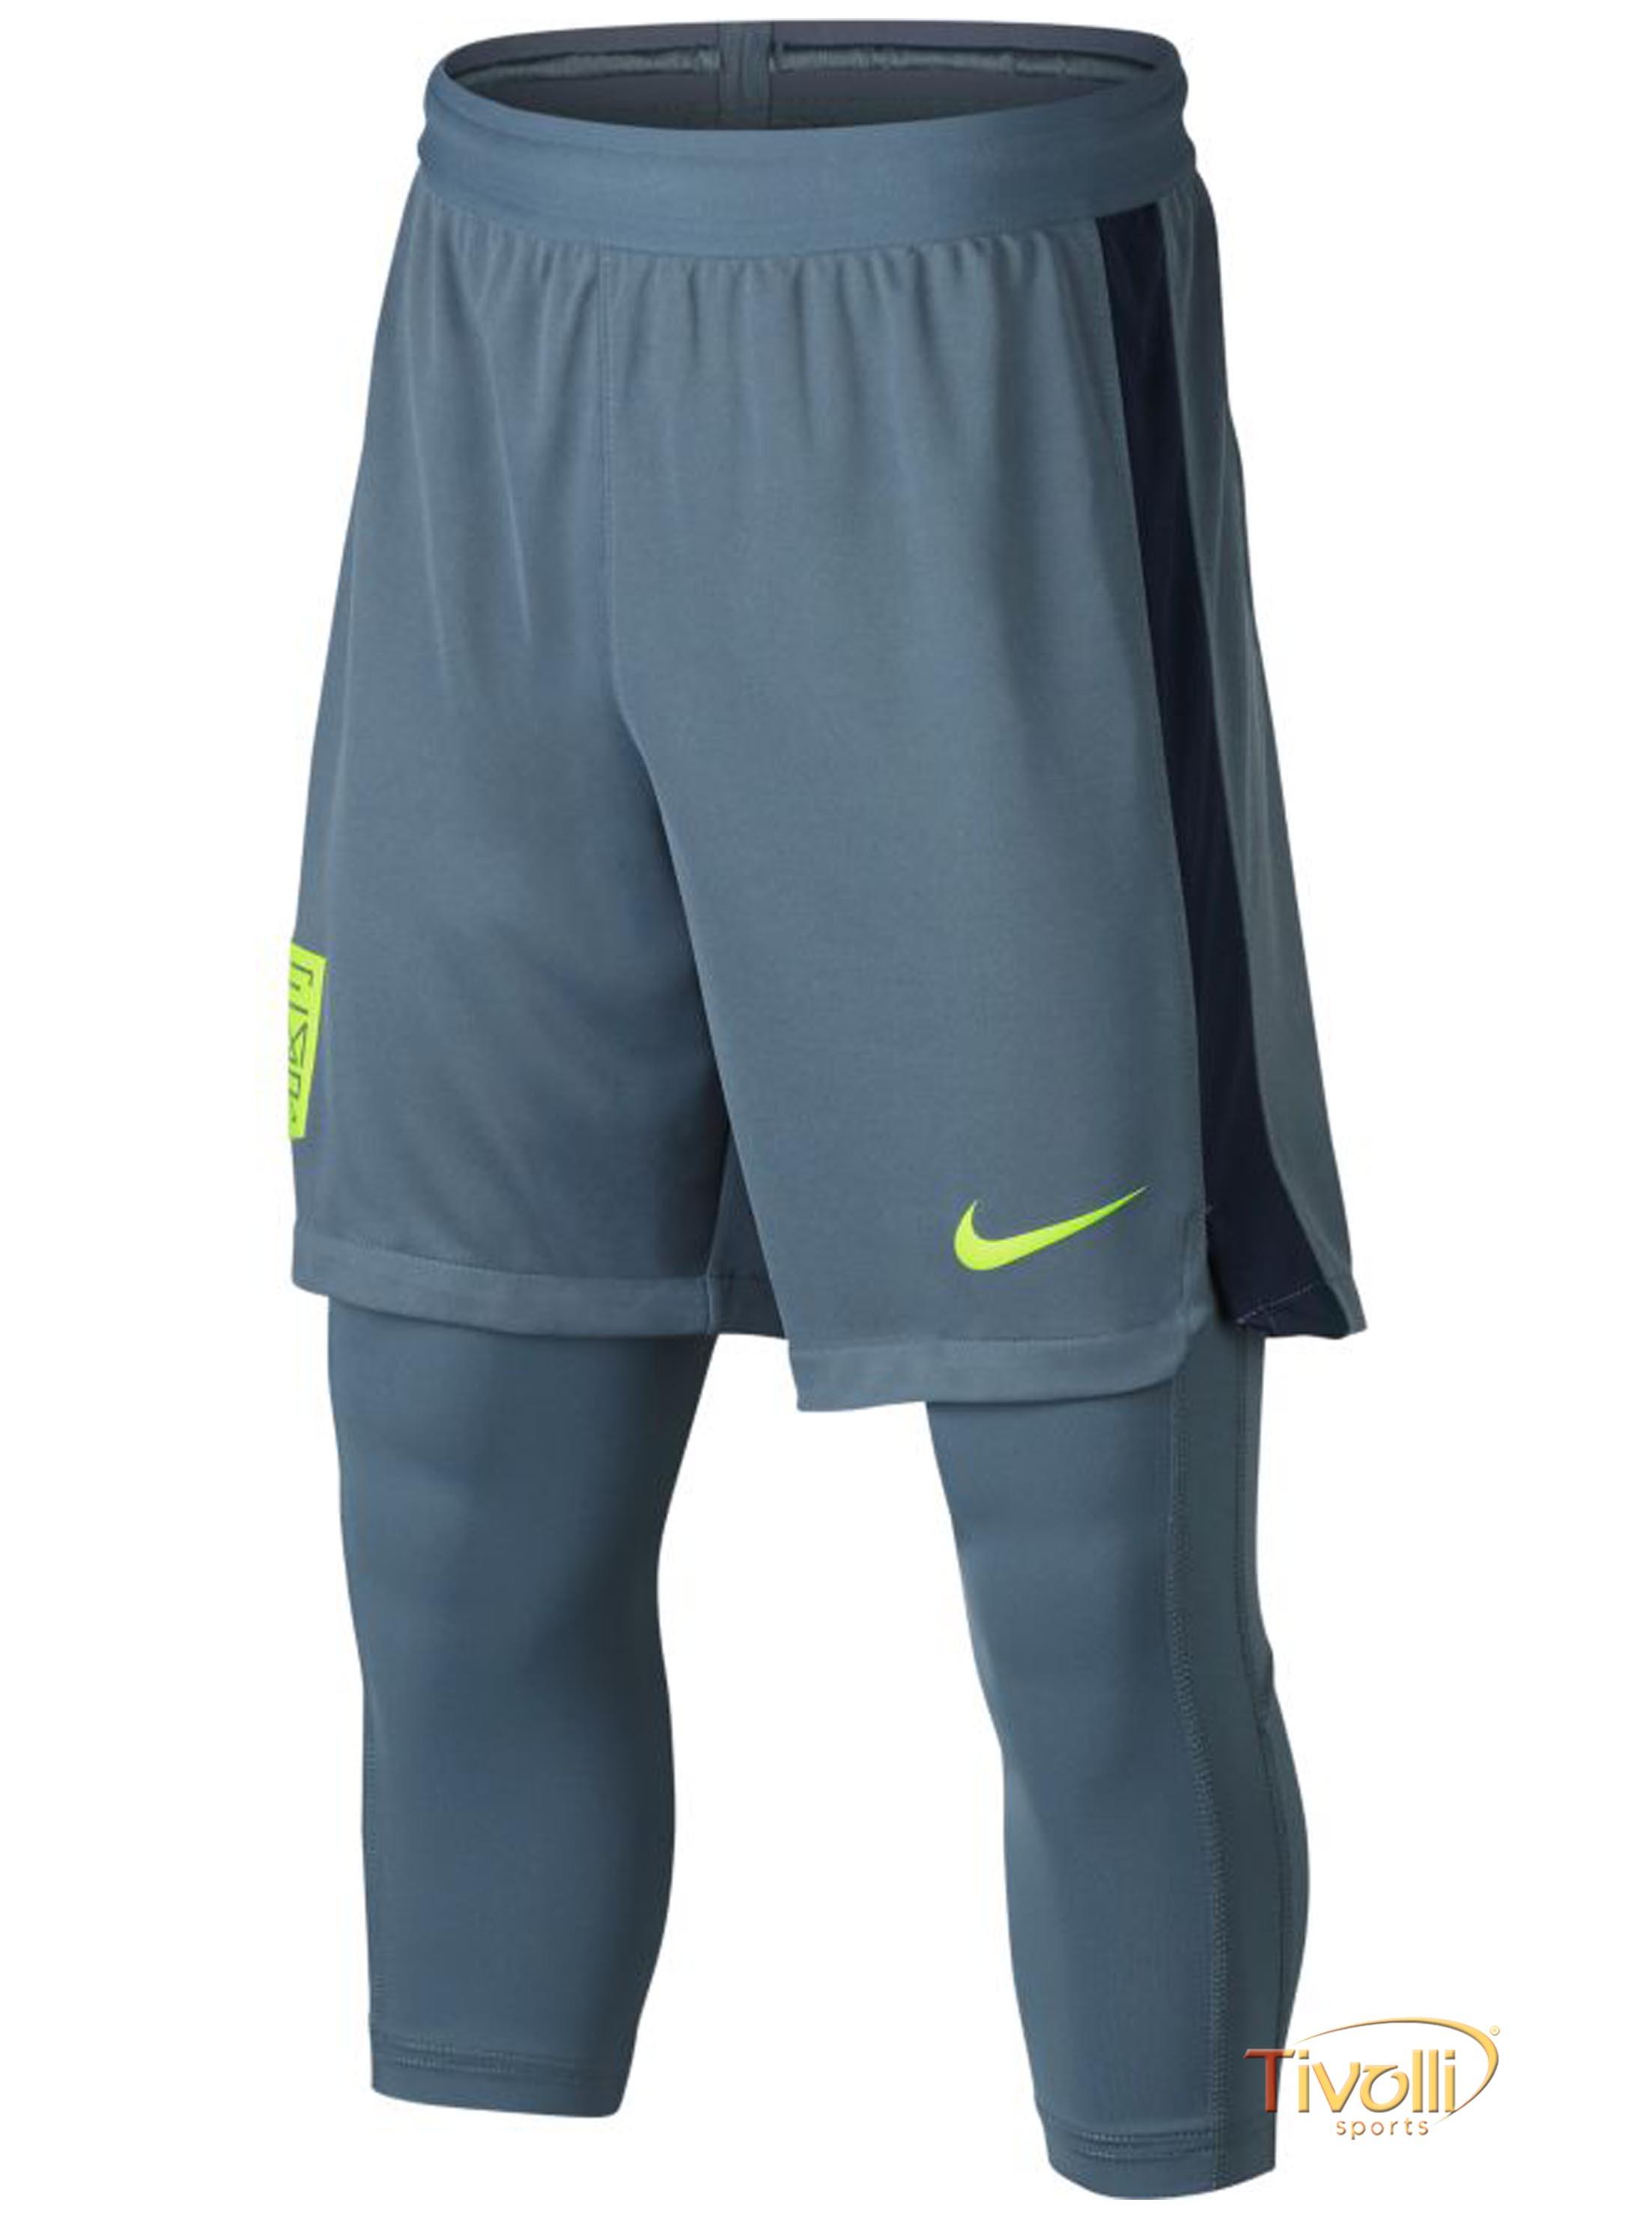 04768f8947e67 Shorts-Calça Nike Neymar Dry Squad 2In1 Infantil